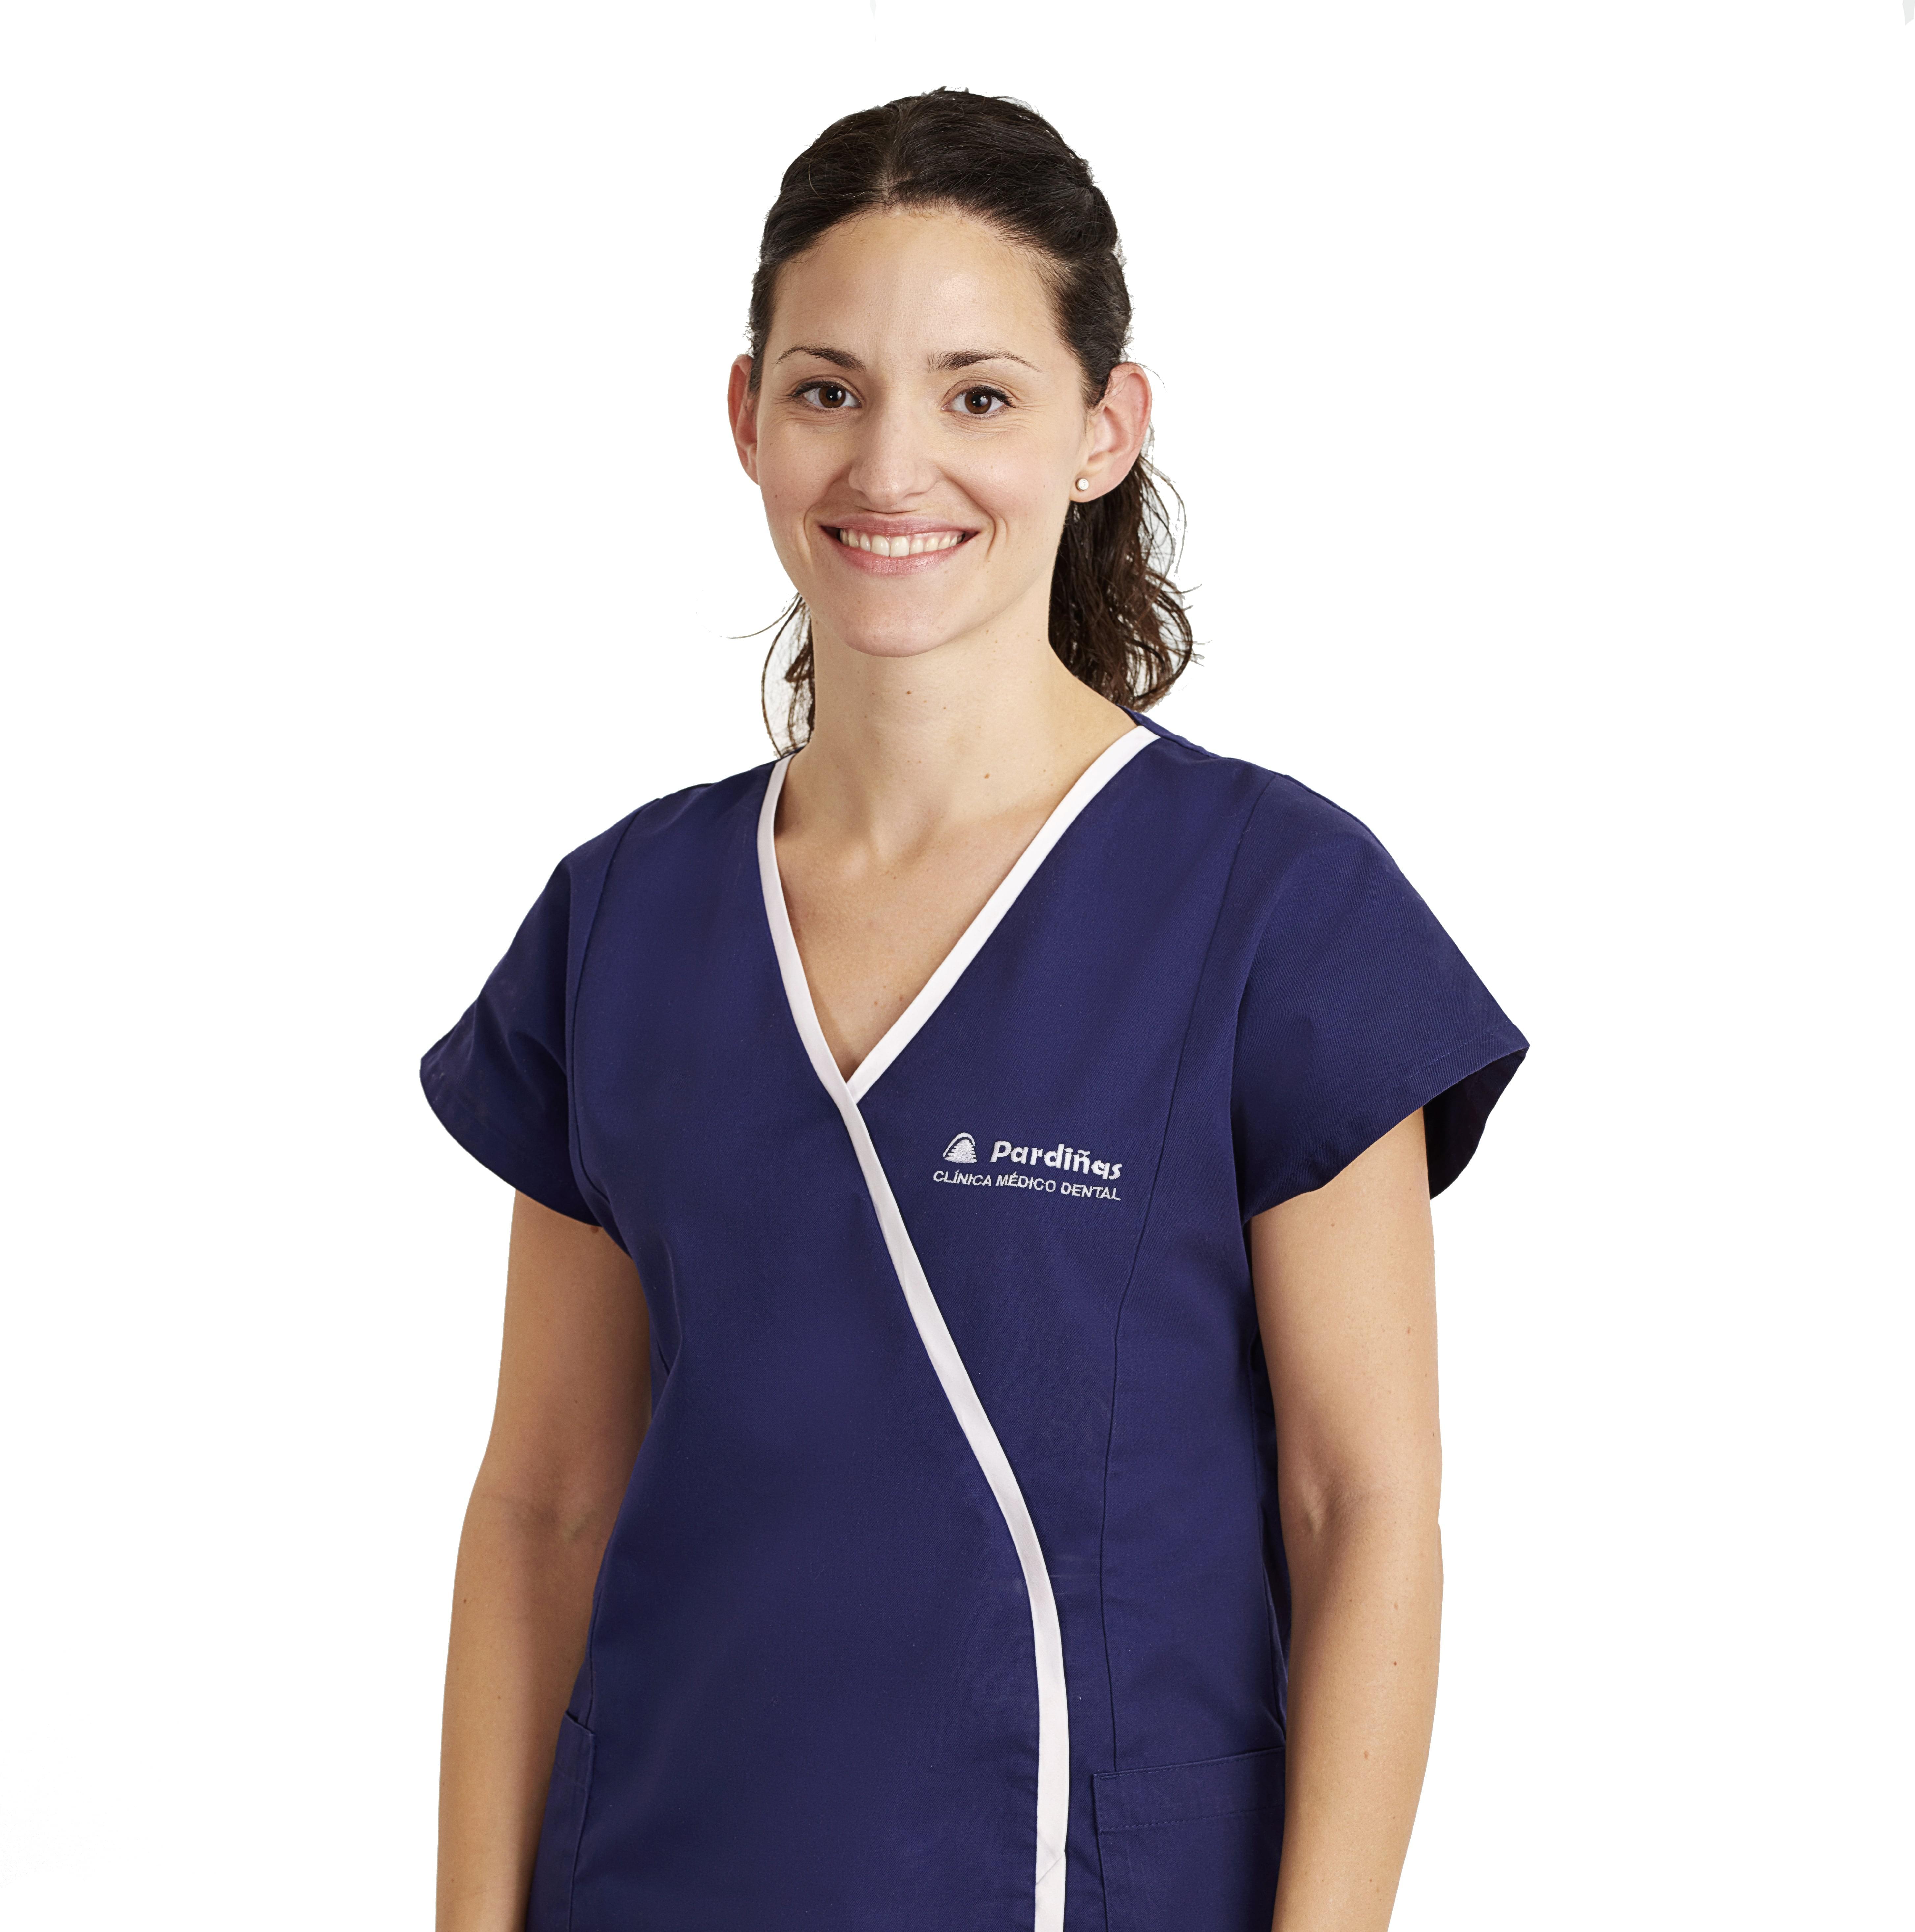 Dra. Sonia Liste Grela: Doctor in Dental Surgery